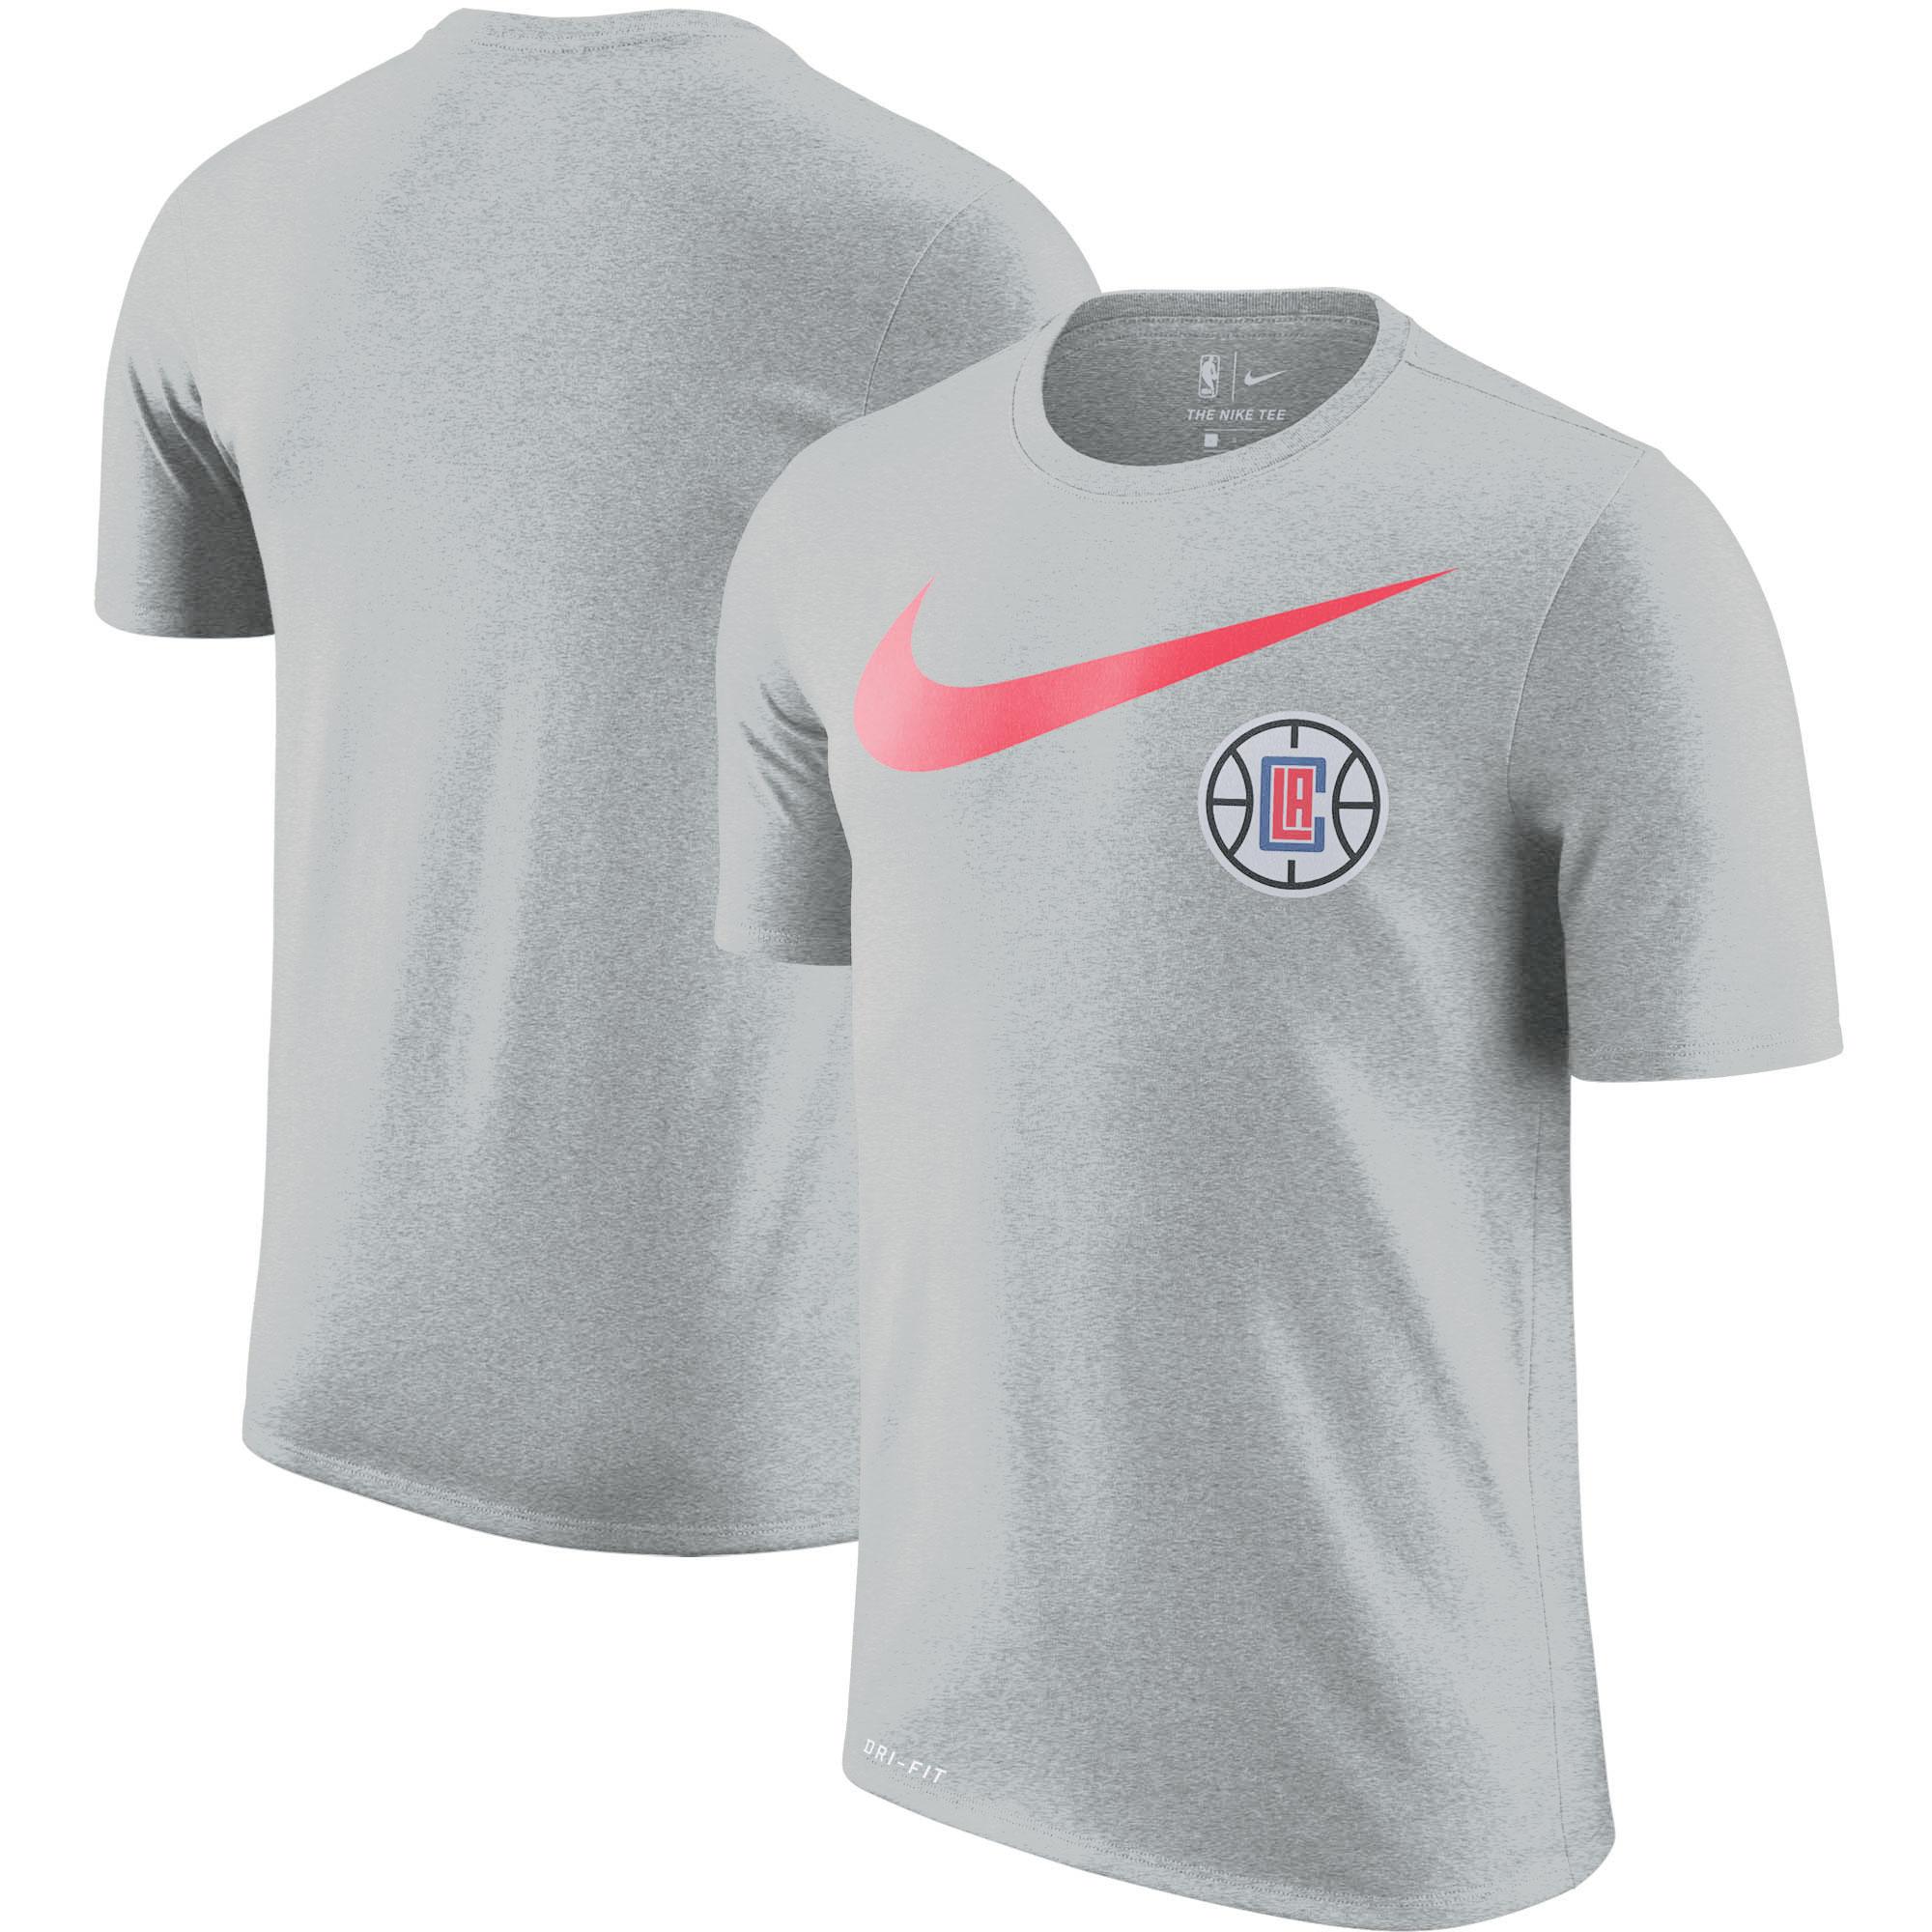 LA Clippers Nike Essential Swoosh Logo Legend Performance T-Shirt - Heather Charcoal